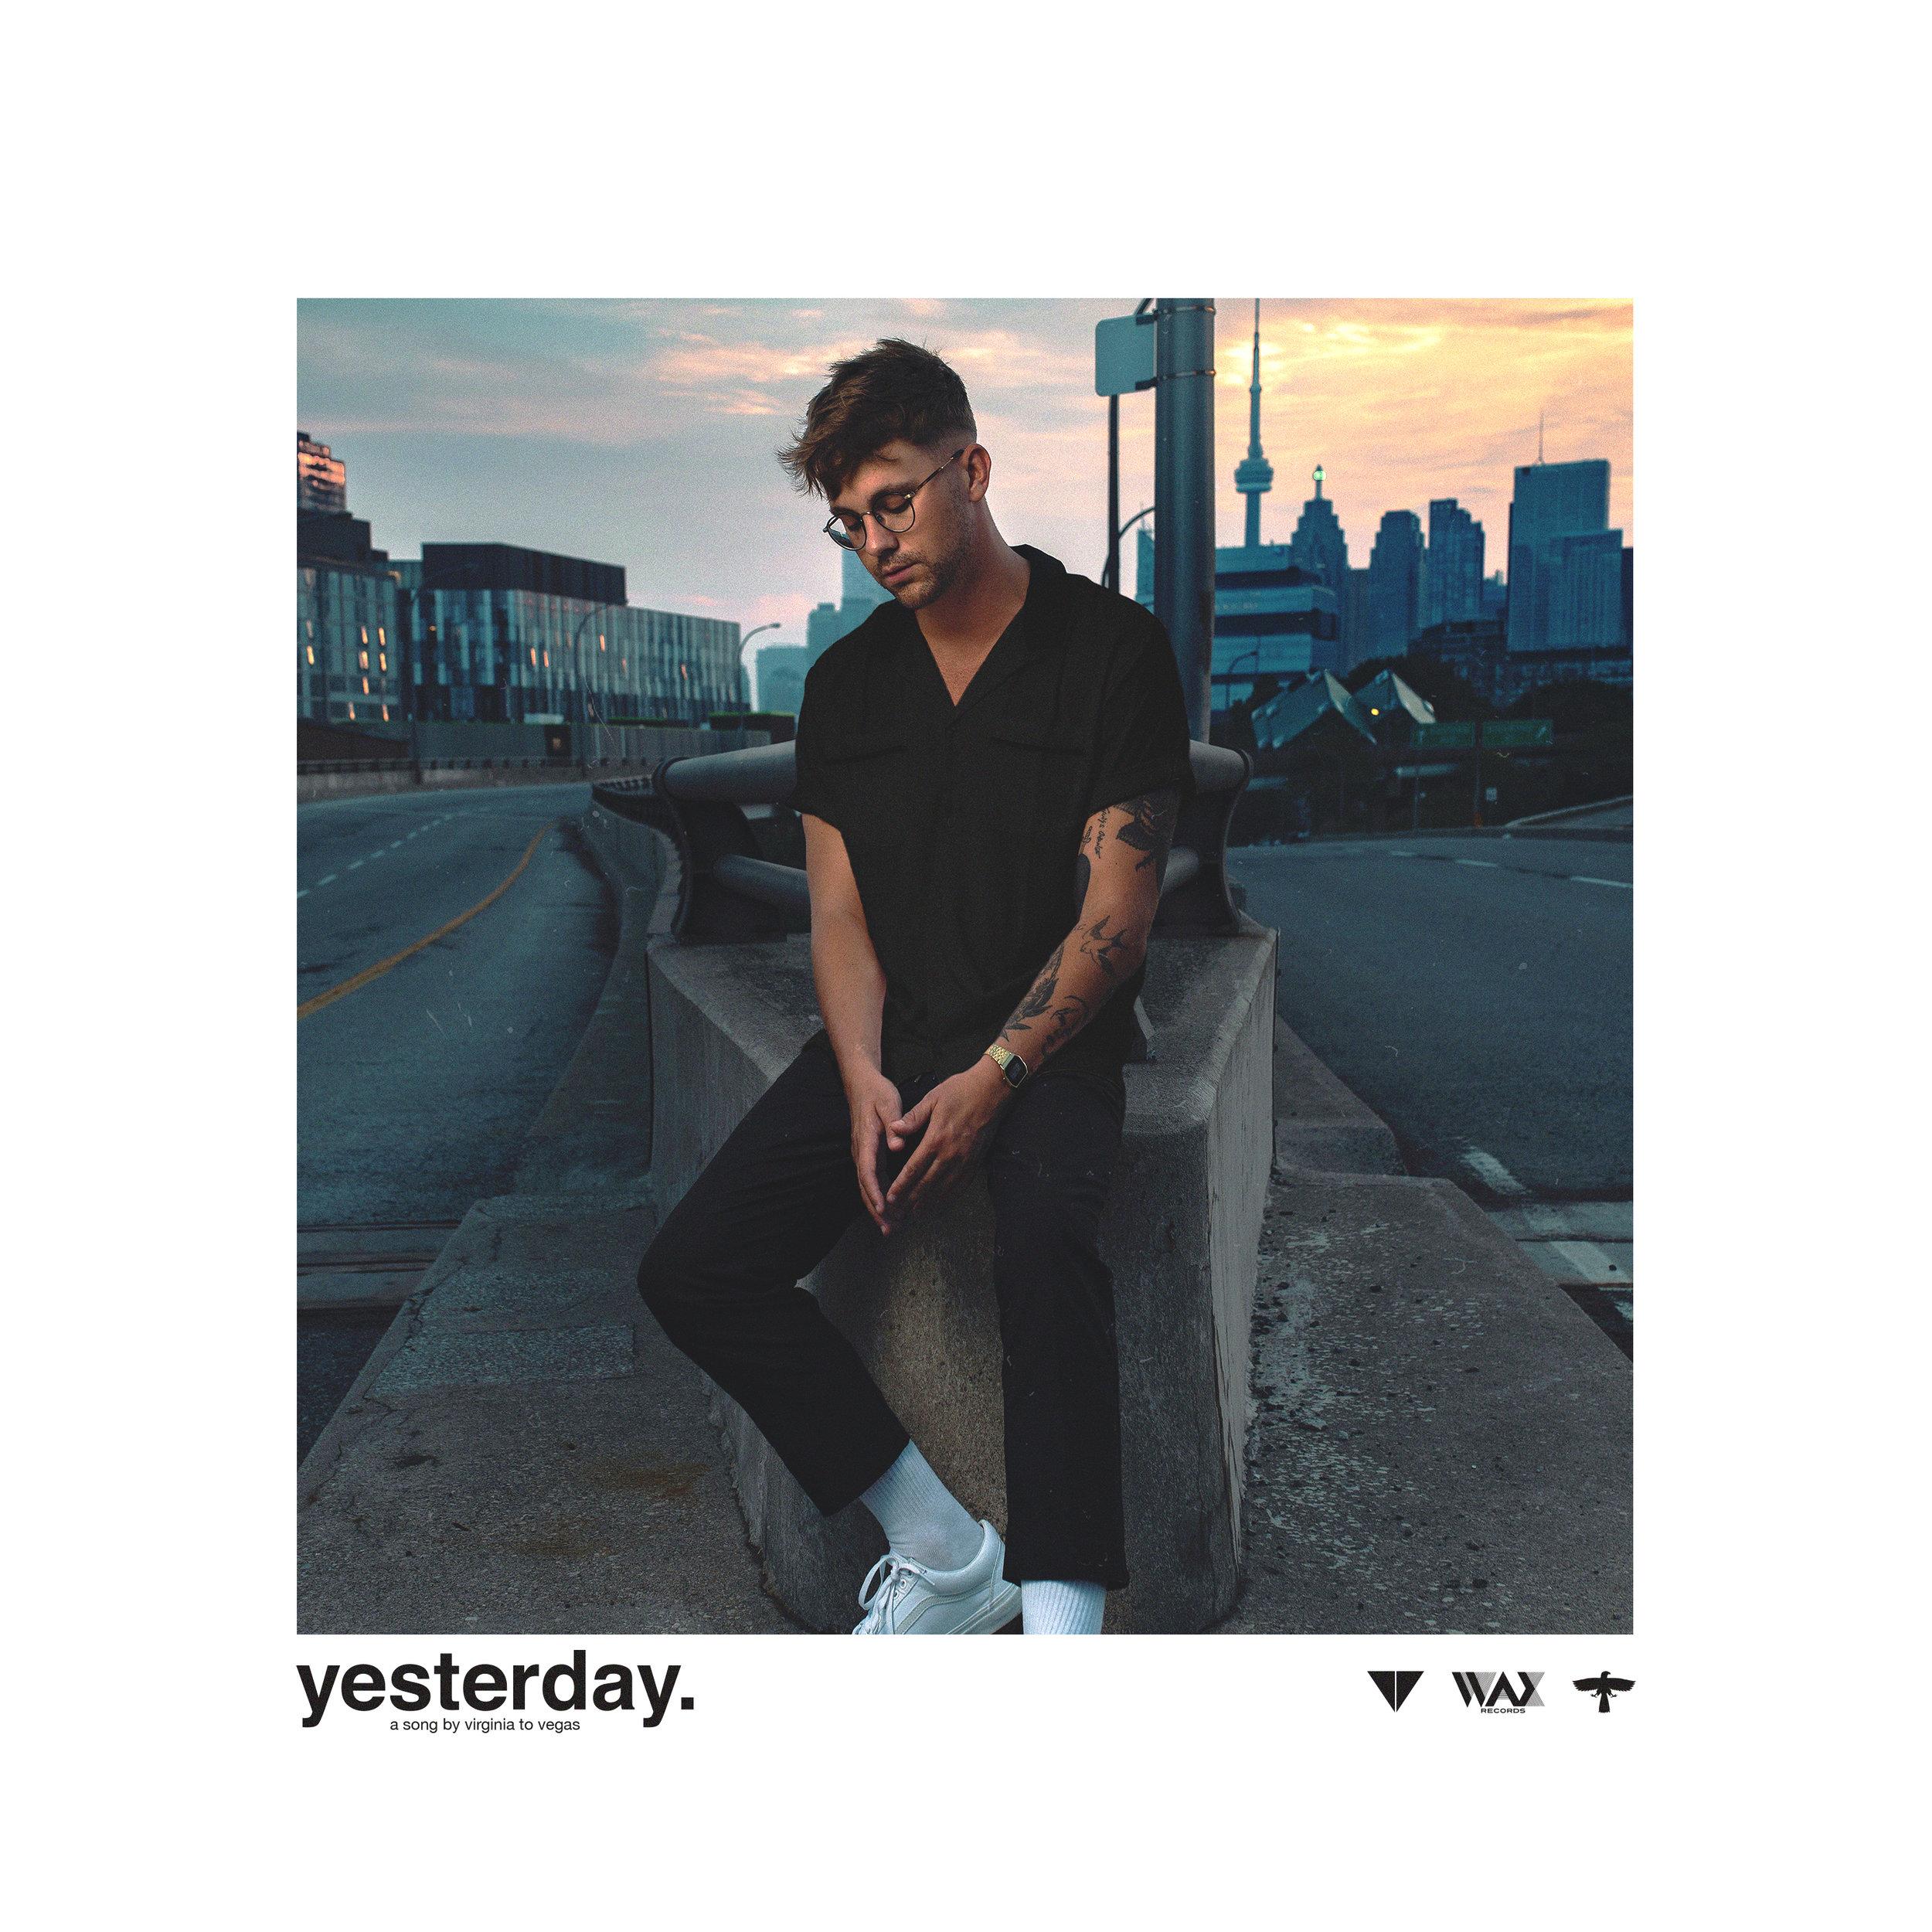 VIIV_YESTERDAY_ARTWORK.jpg